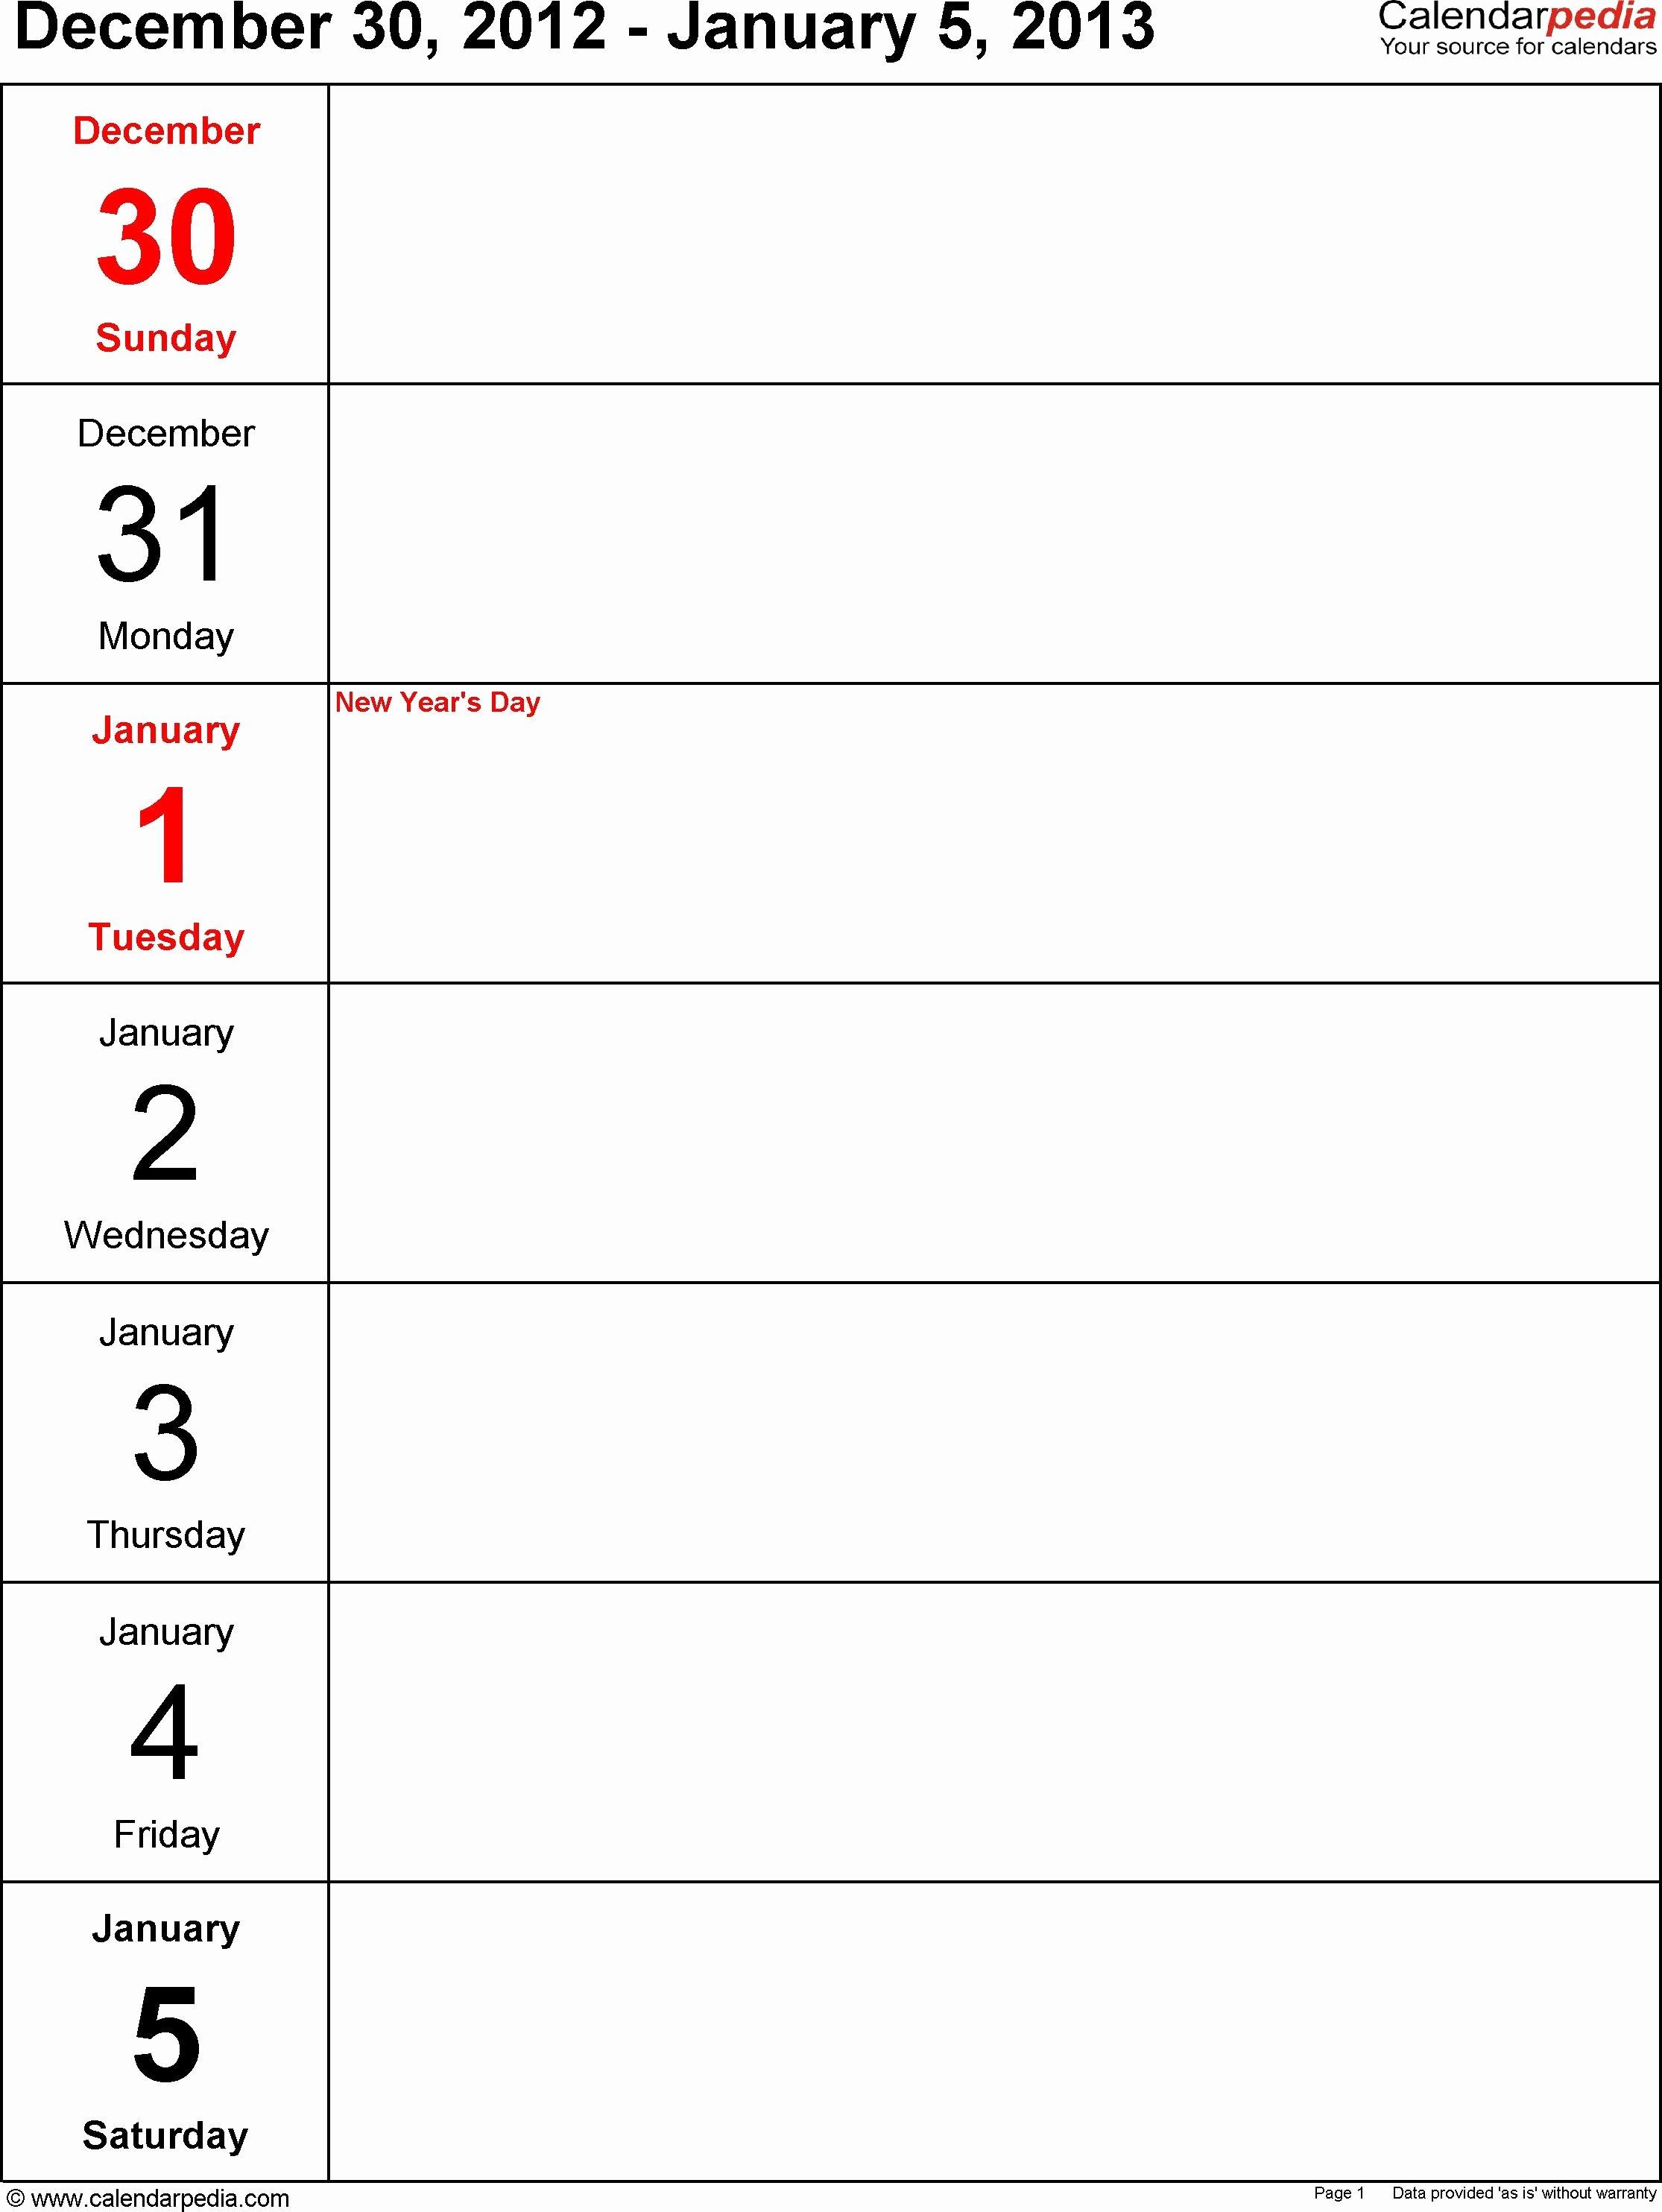 Calendar Template for Pages Mac New Calendar Template for Mac Pages Free Archives Calendar